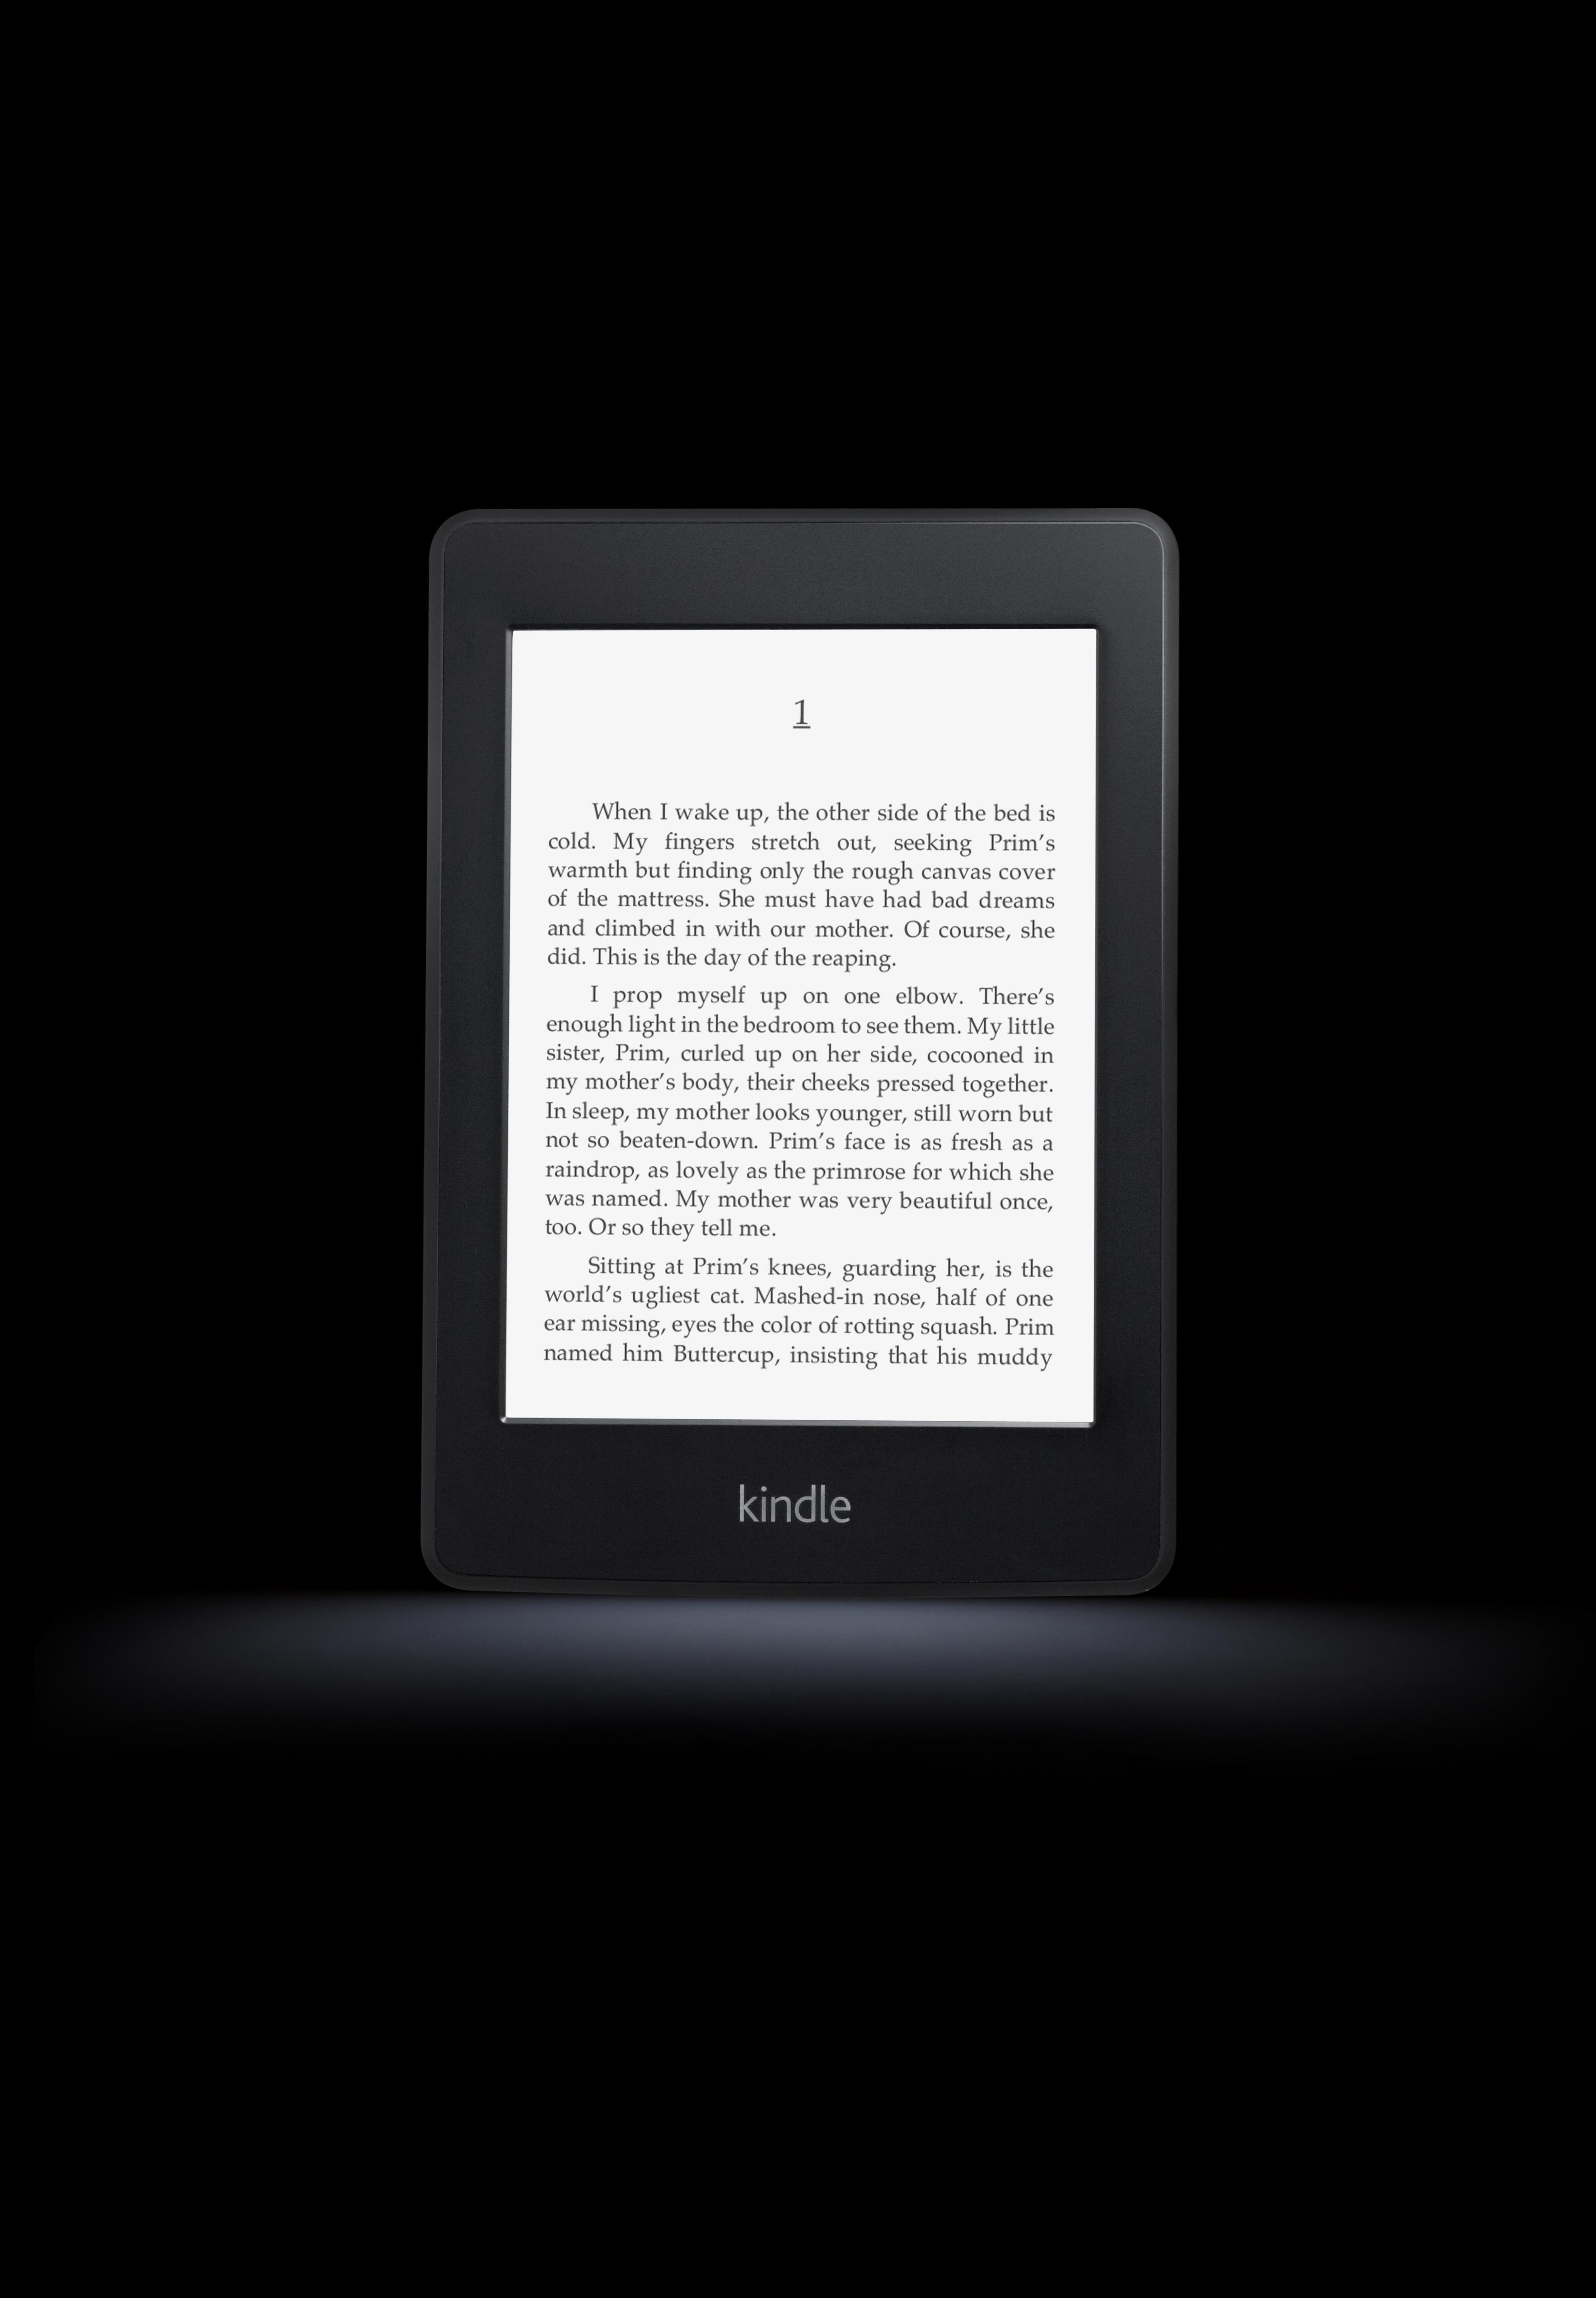 Kindle Vs Sony Reader: Amazon Announces Kindle Paperwhite